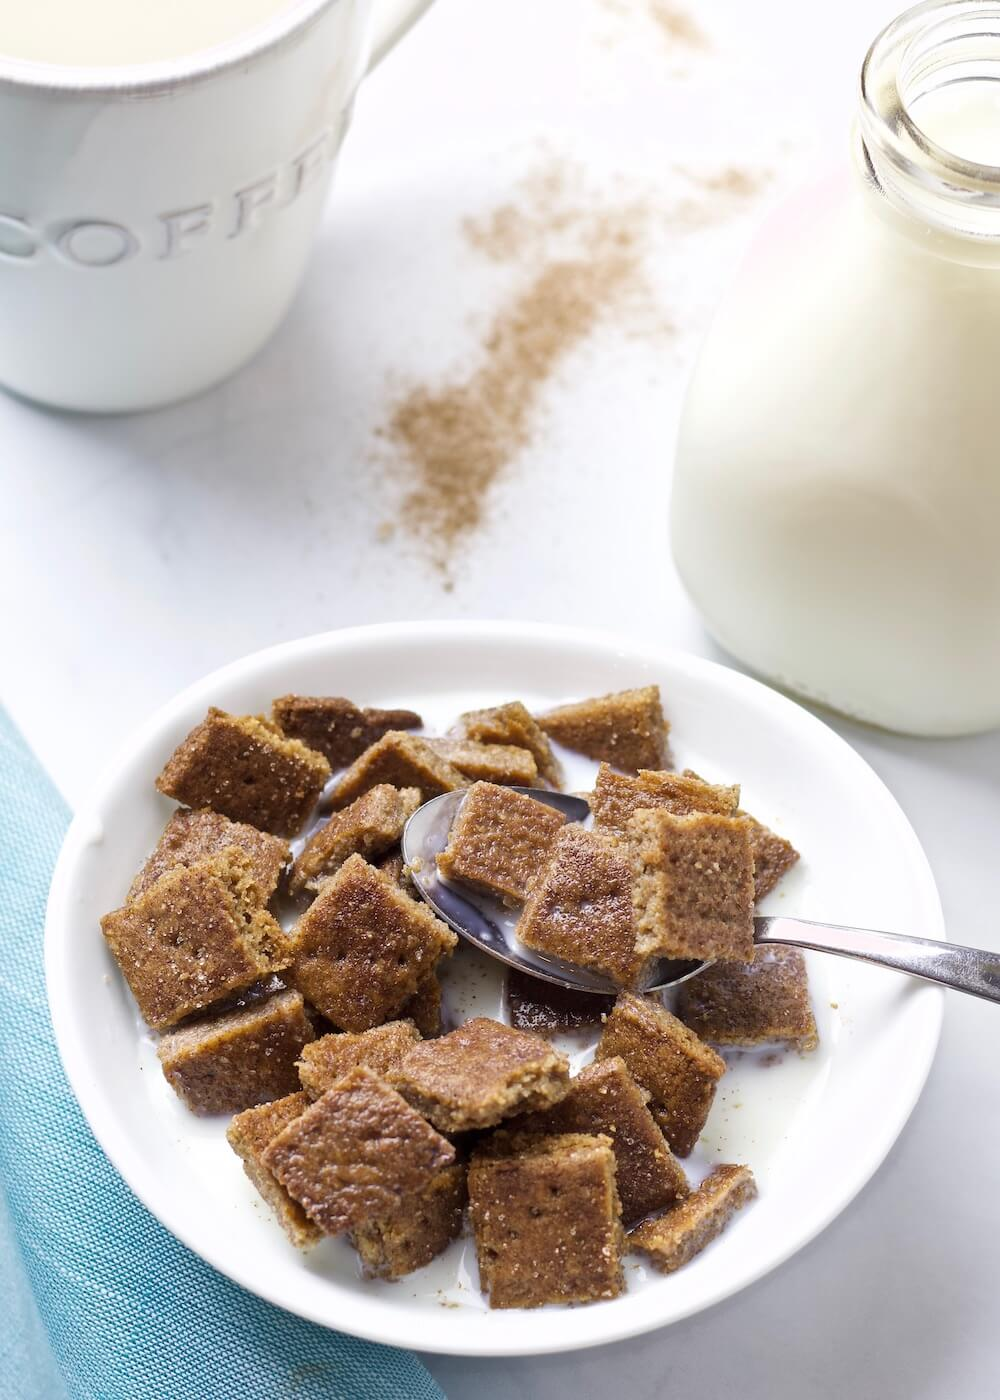 Keto Cinnamon Toast Crunch Recipe